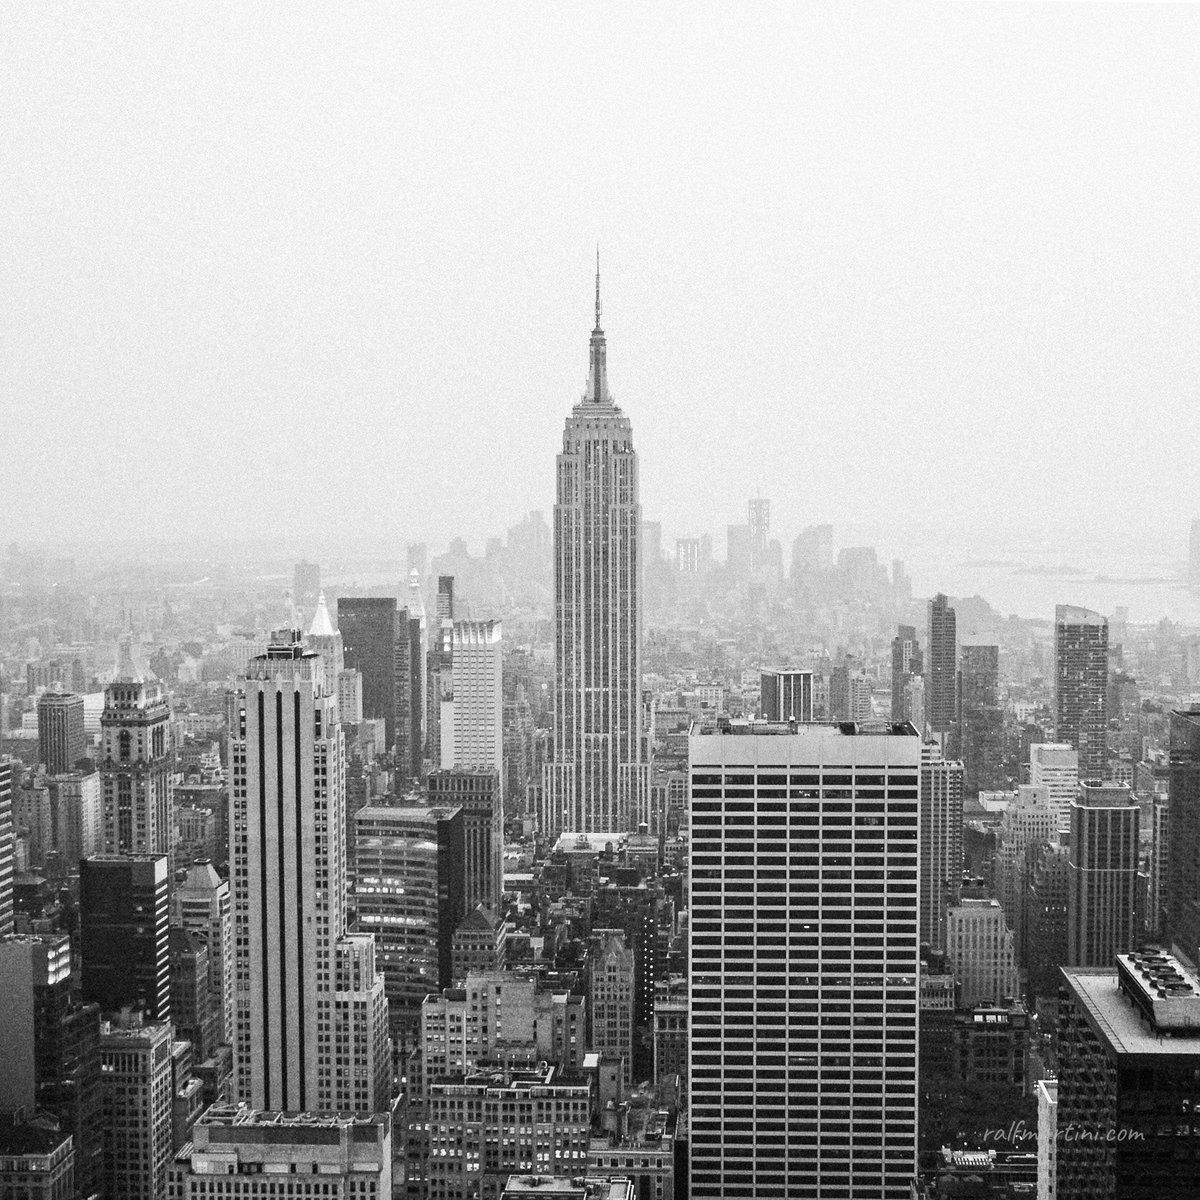 an NYC classic  (#nyc #newyork #newyorkcity #empirestate #empirestatebuilding #cityscape #landmark #blackandwhitephotography #blackandwhite #bnwphotography #travelphotography #travel #architecture #usa)